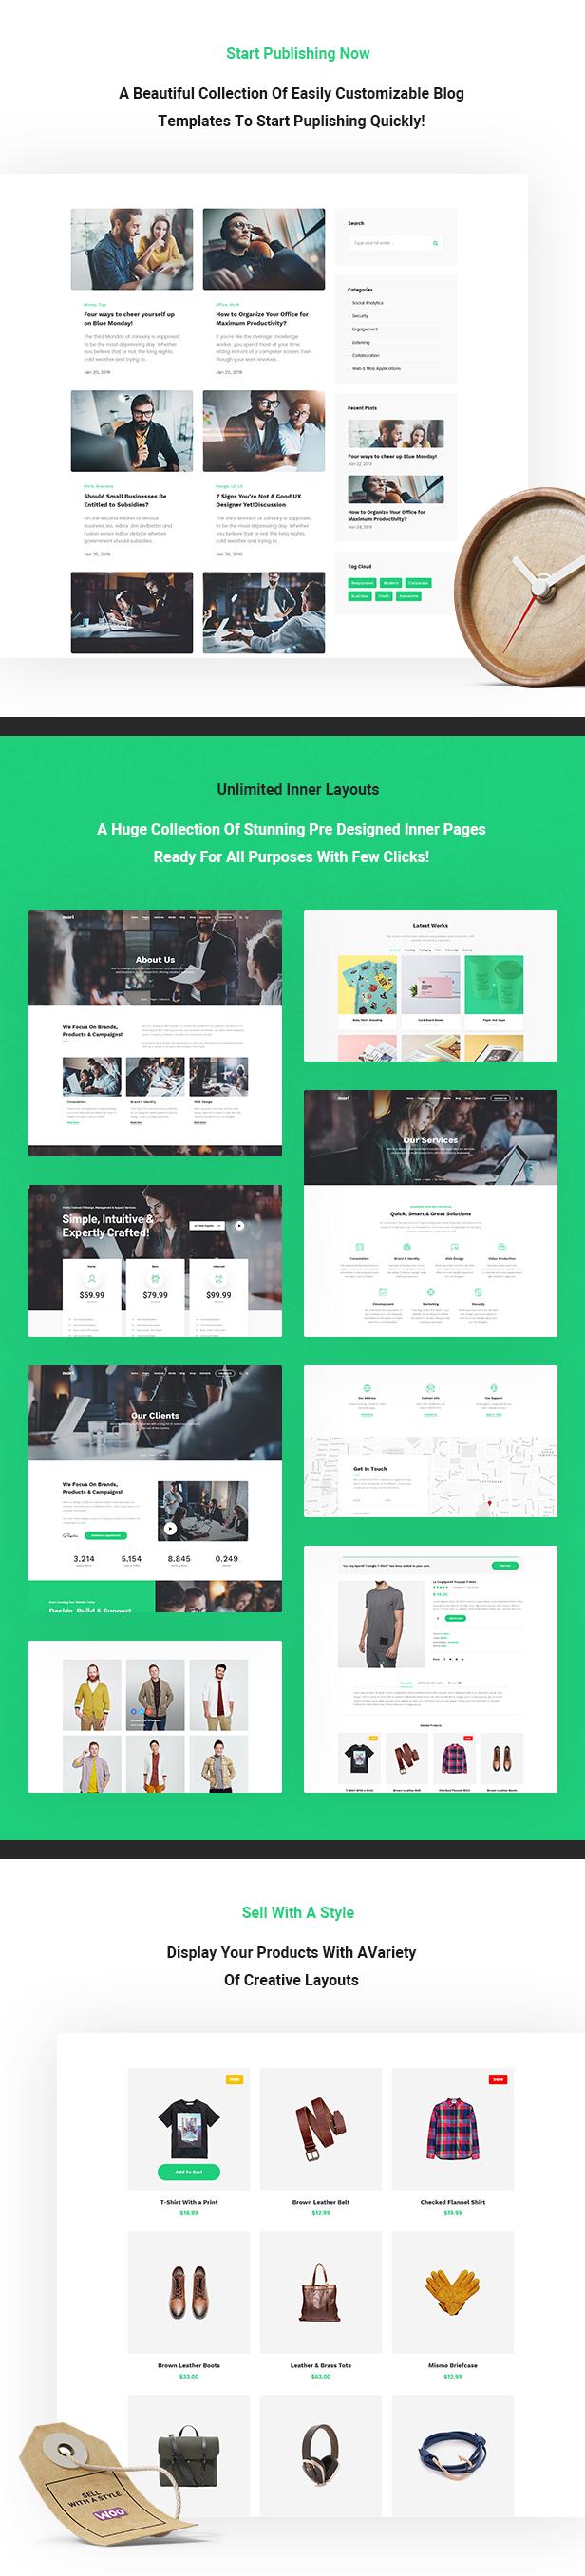 Mori - Business Corporate WordPress Theme - 5